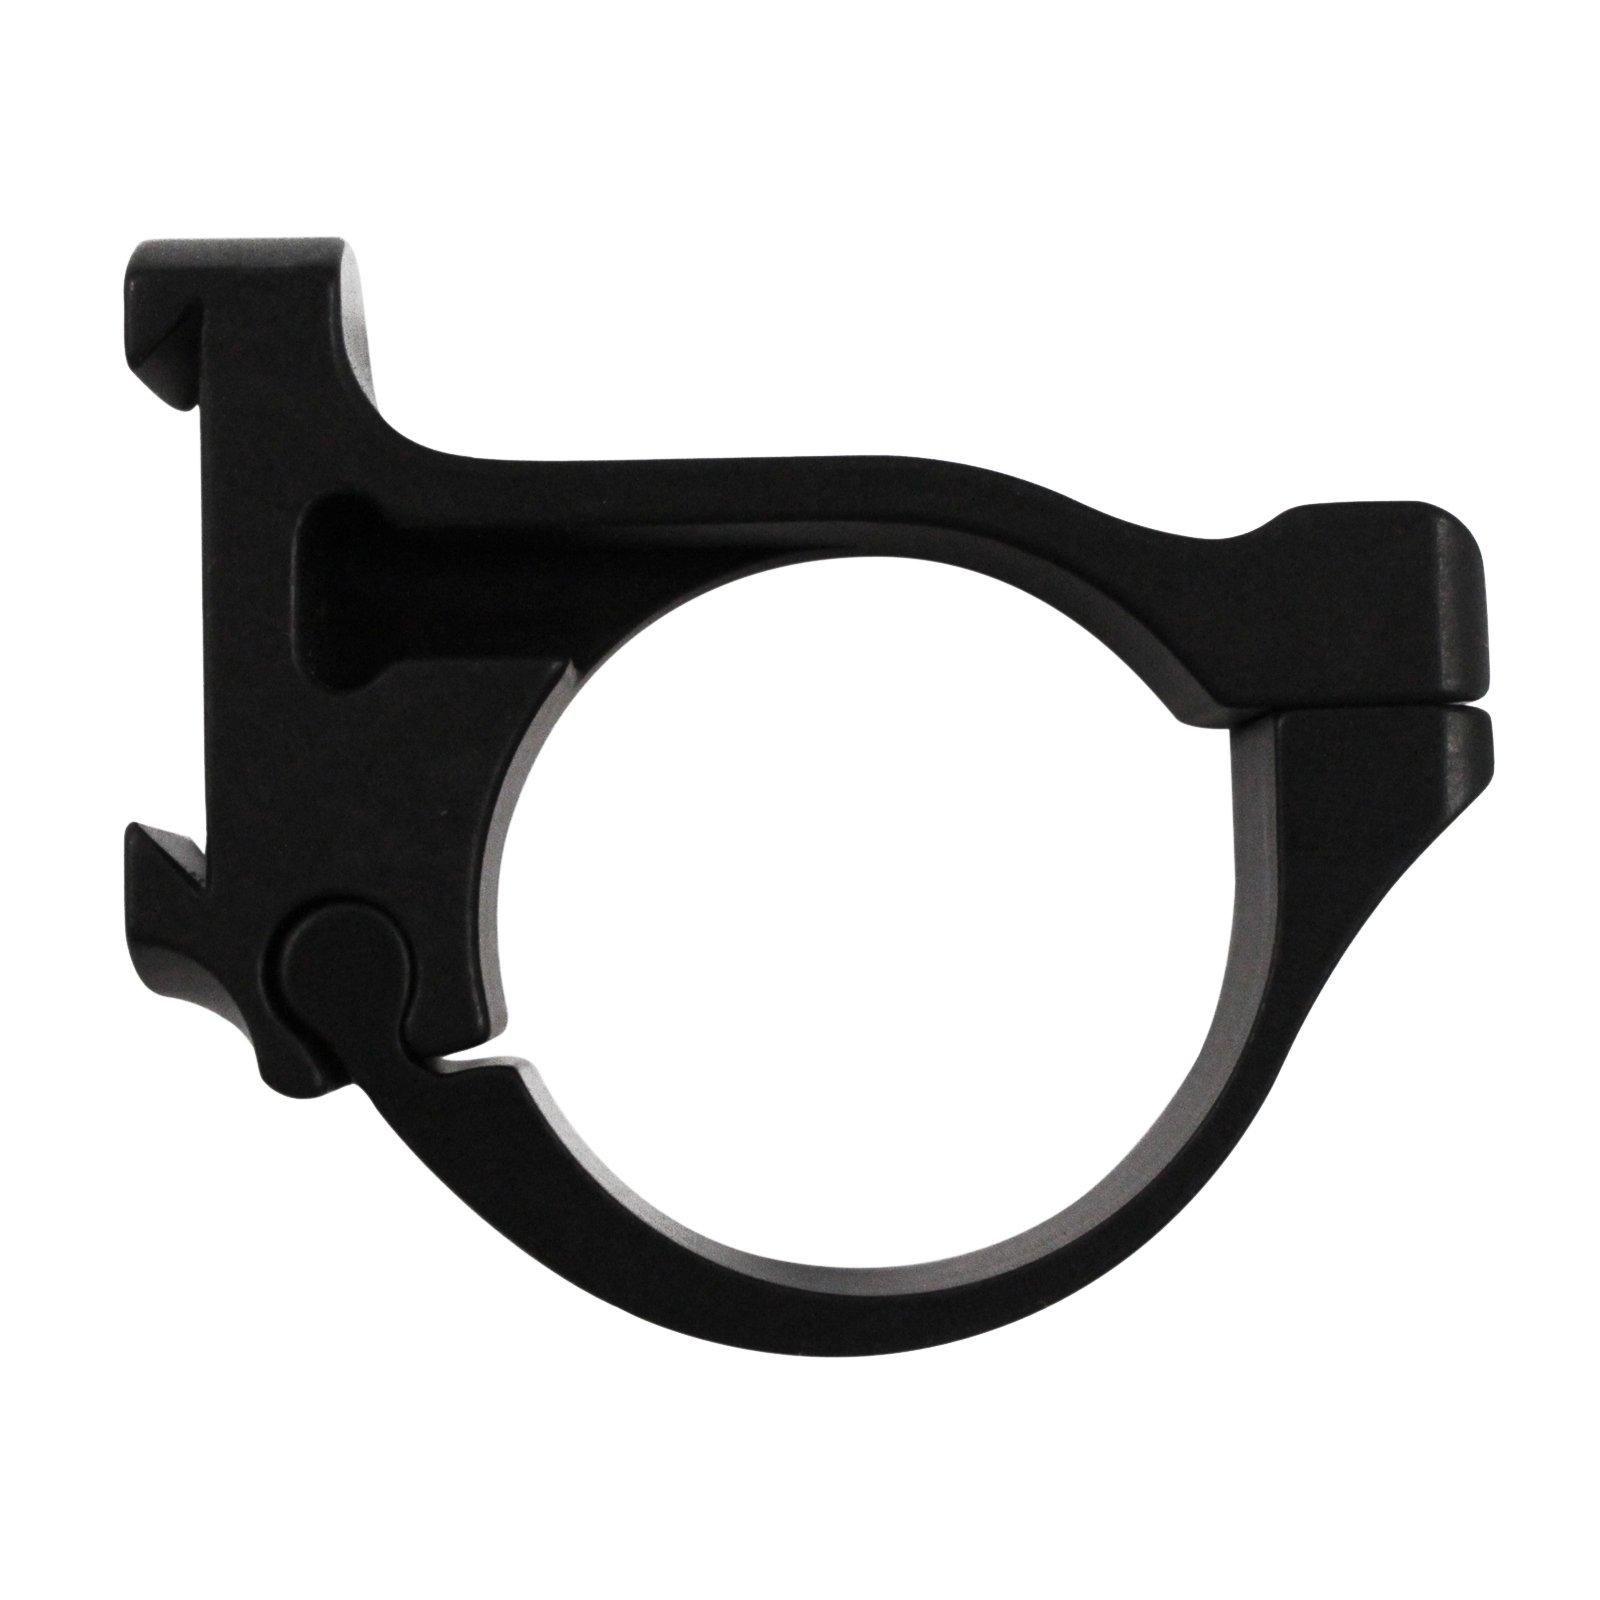 Flatline Ops Hitch HIker ADI/ACI Mount 30mm